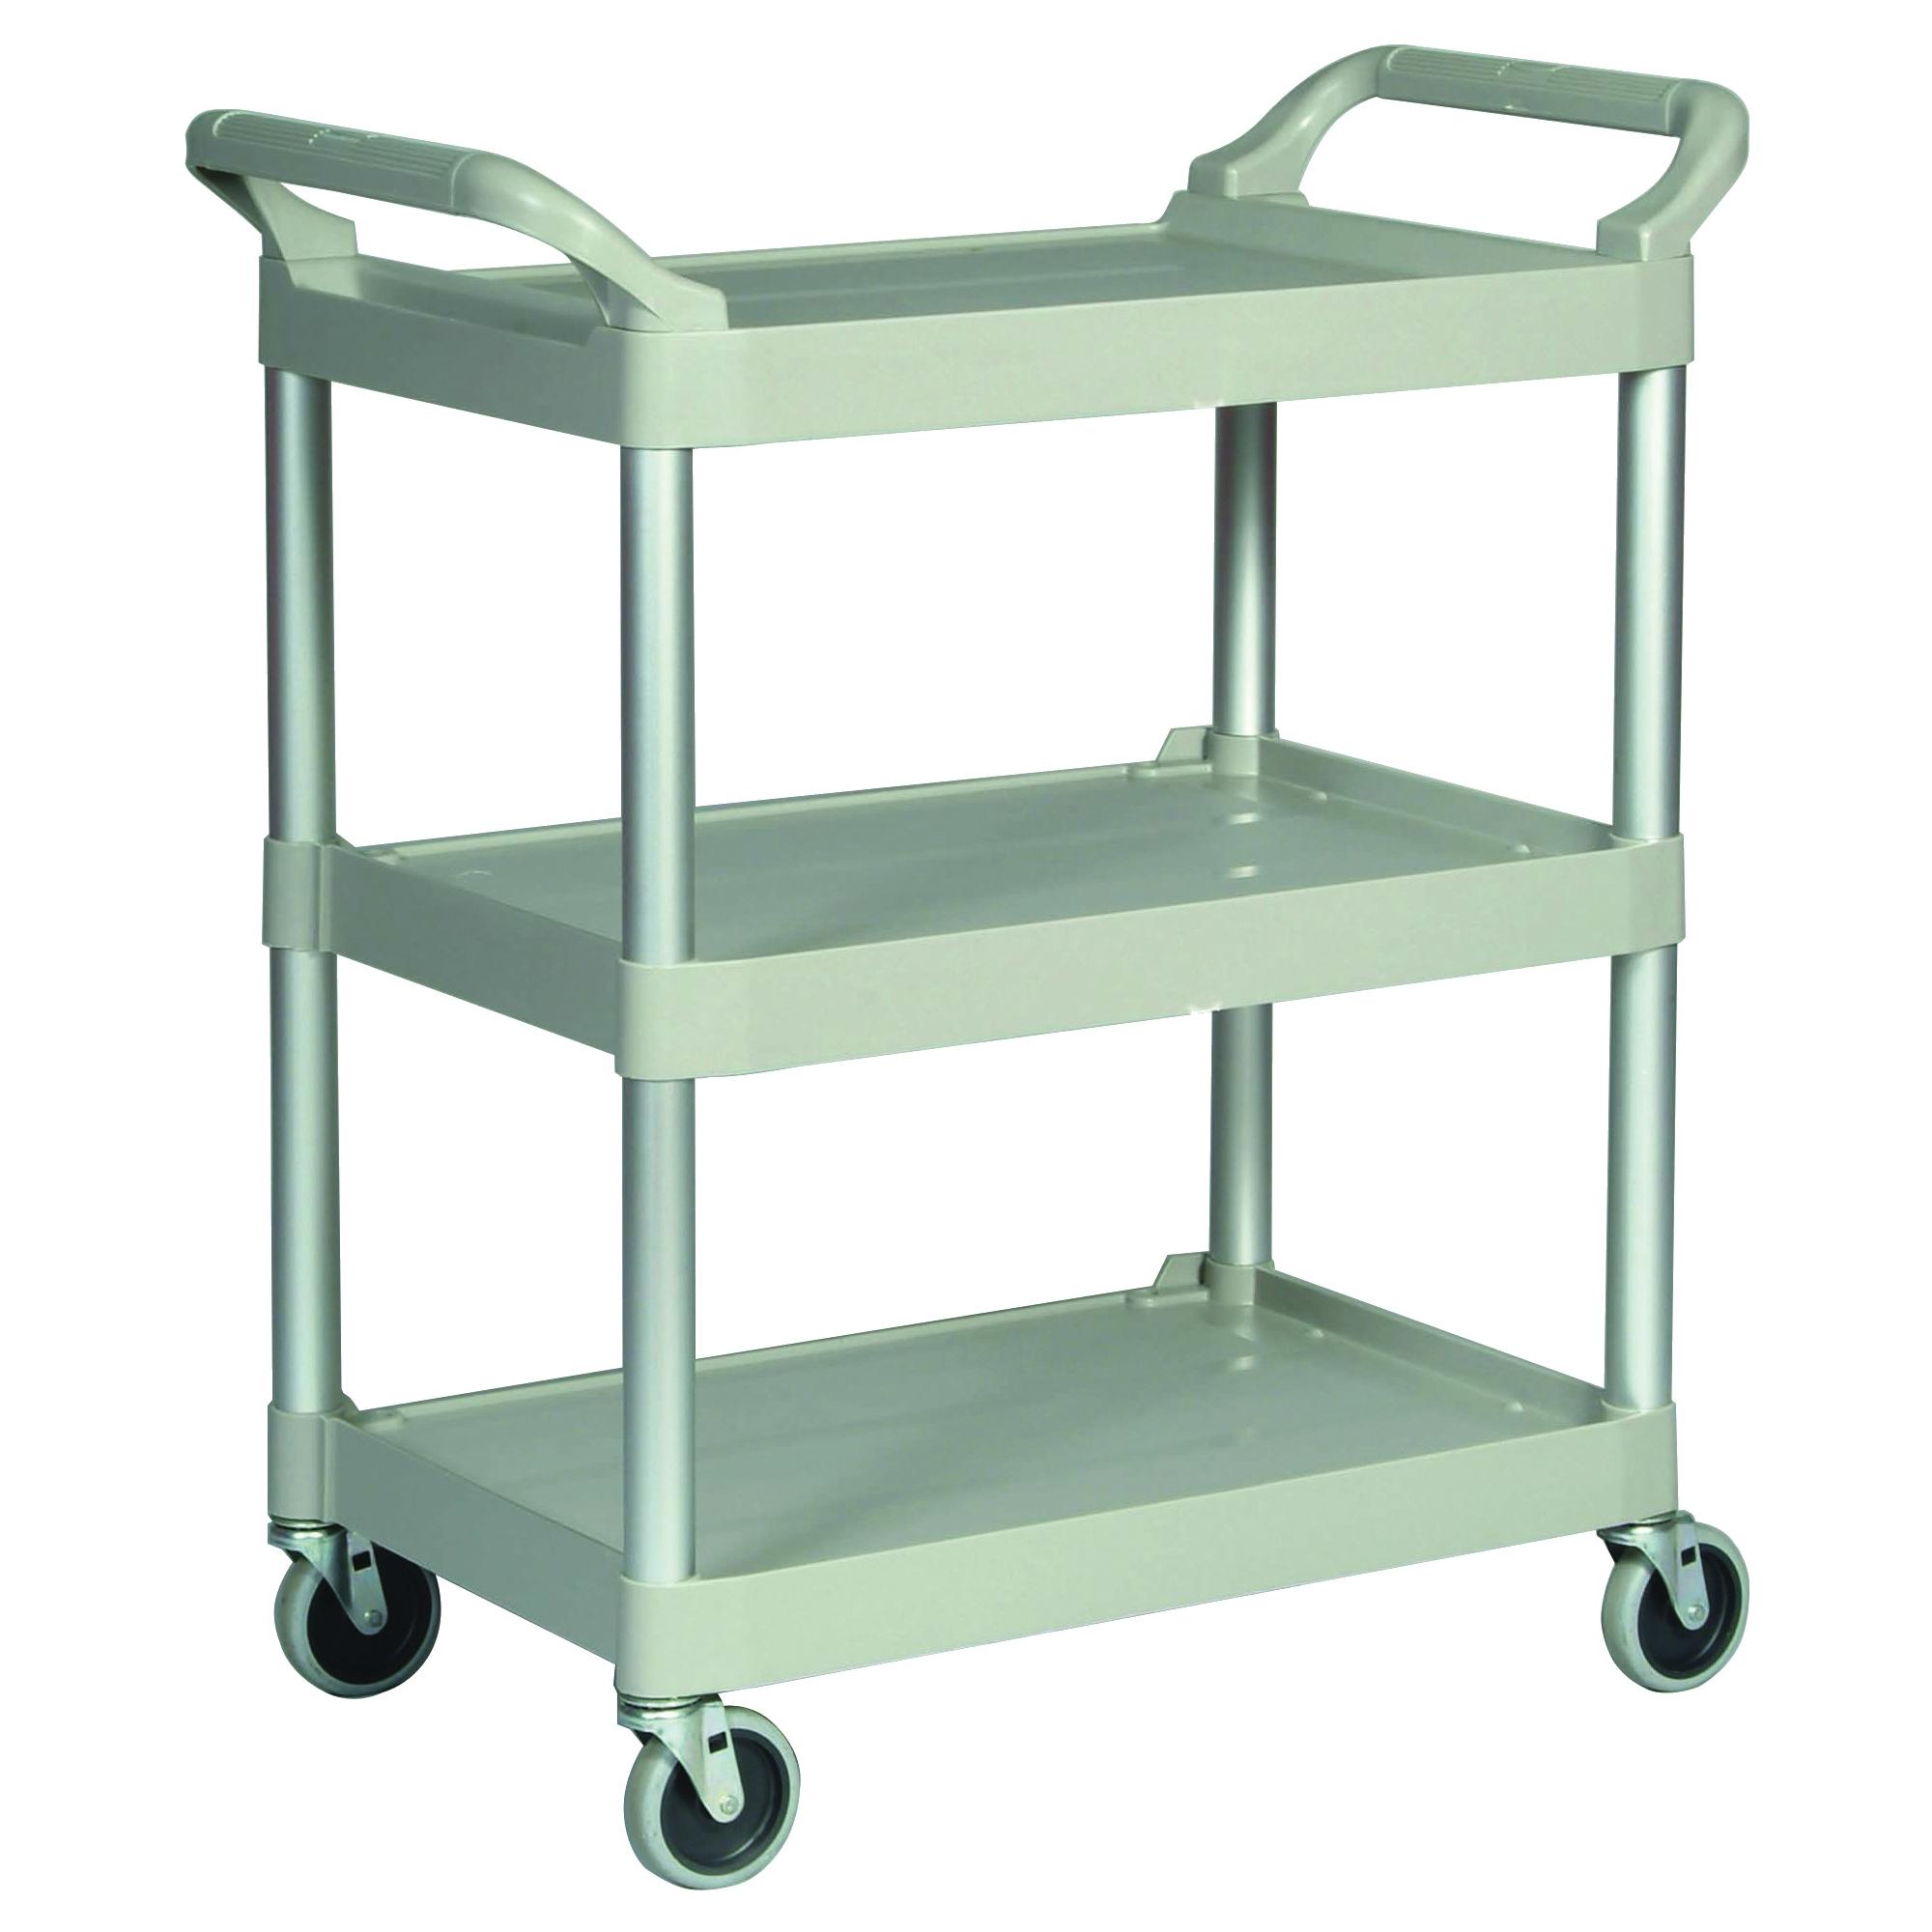 Picture of Rubbermaid FG342488PLAT Service Cart, 18.6 in OAW, 37.8 in OAH, 33.6 in OAL, Plastic Shelf, Platinum Shelf